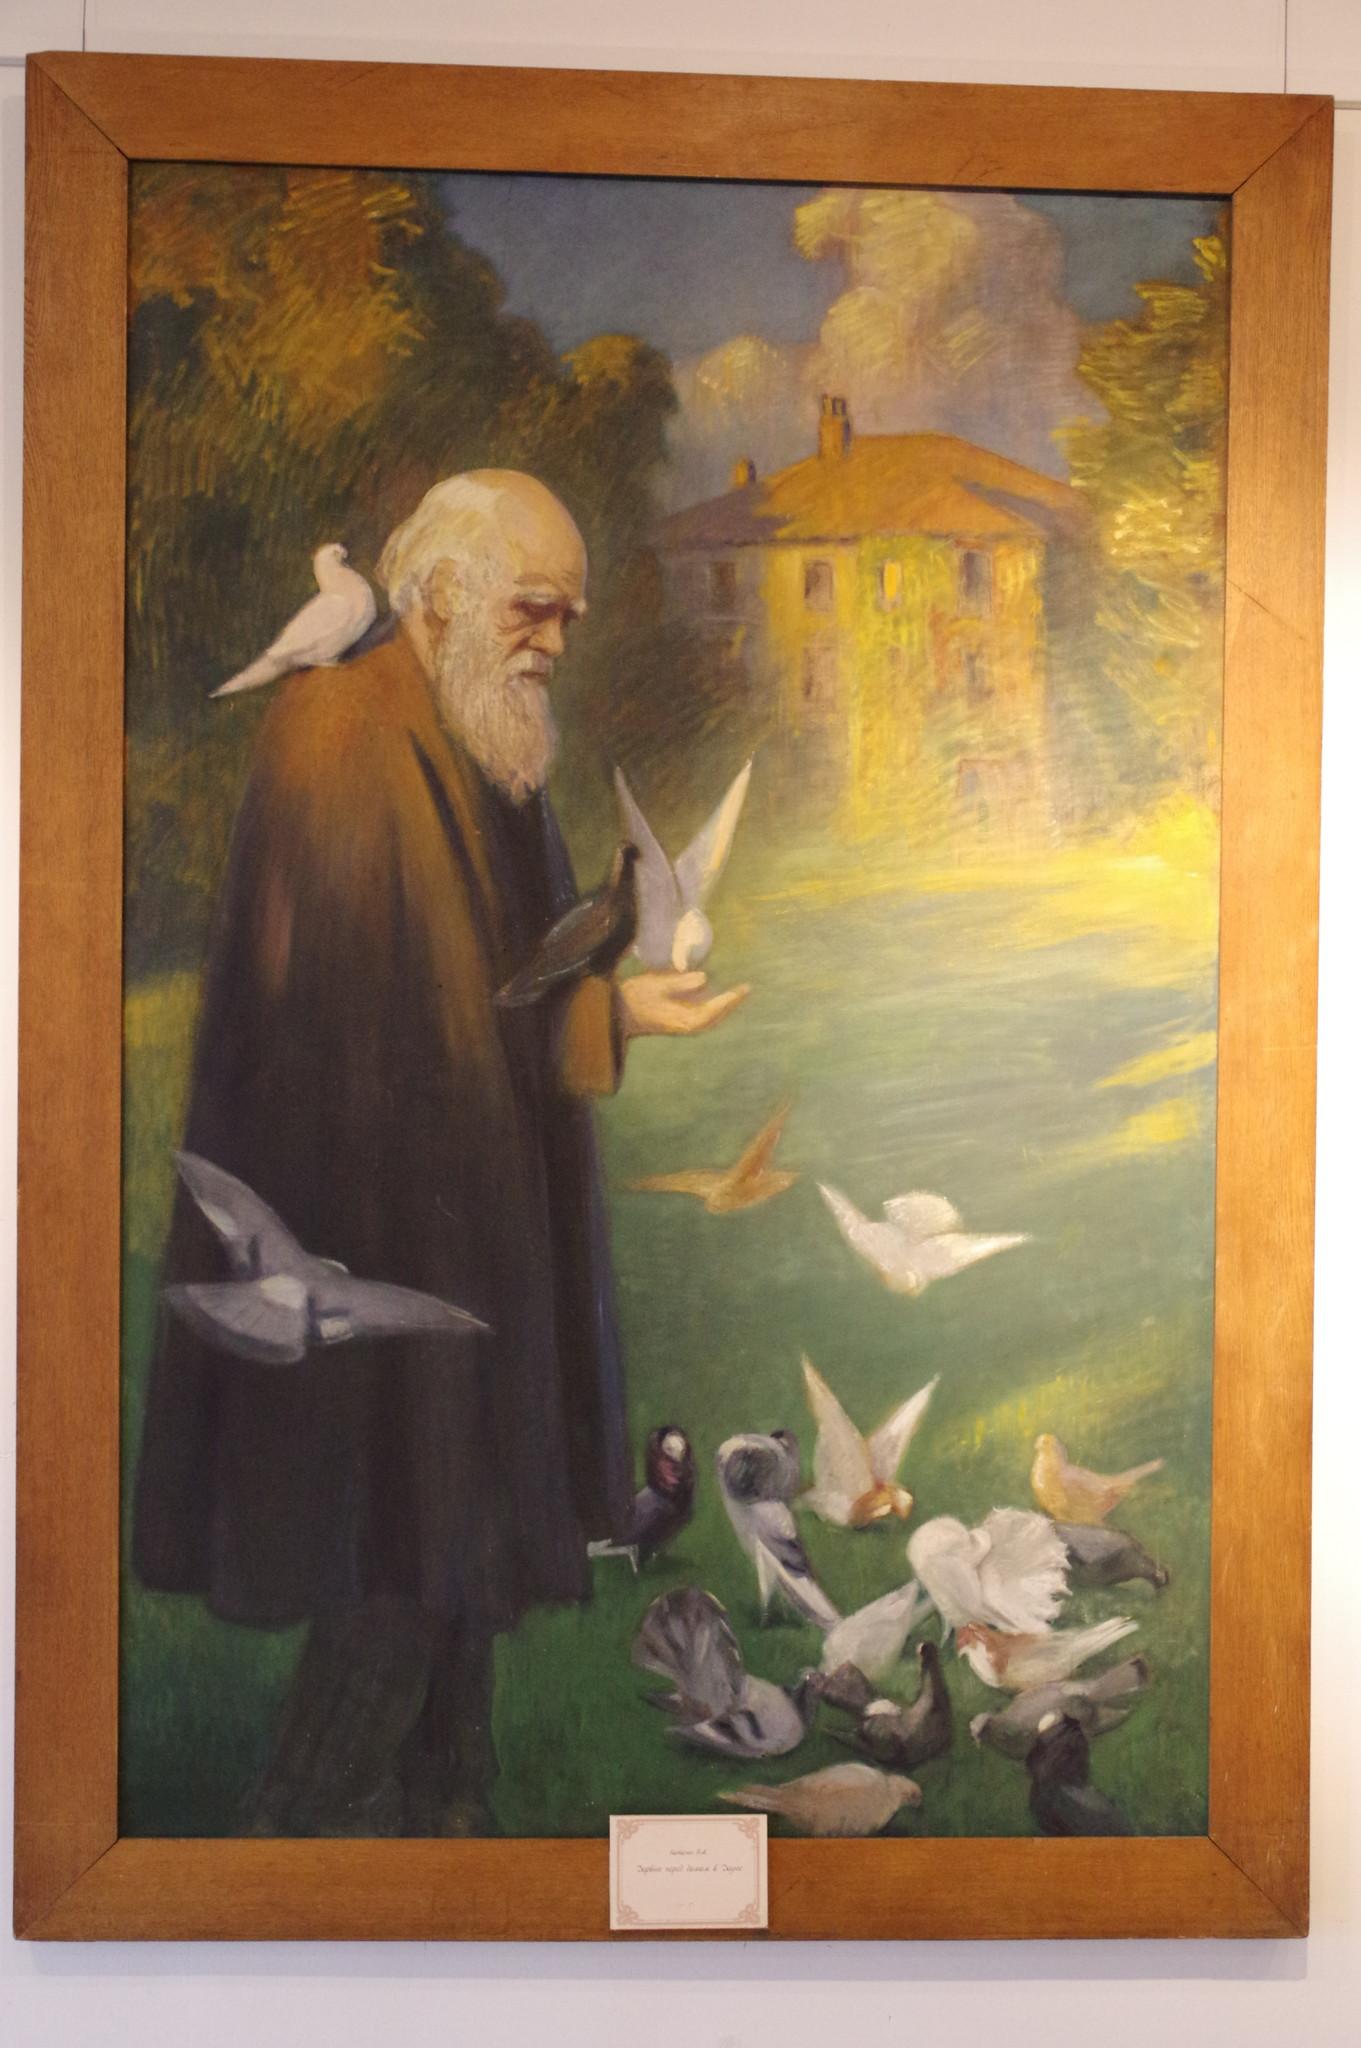 Дарвин перед домом в Дауне. Ватагин В.А. (Государственный Дарвиновский музей)